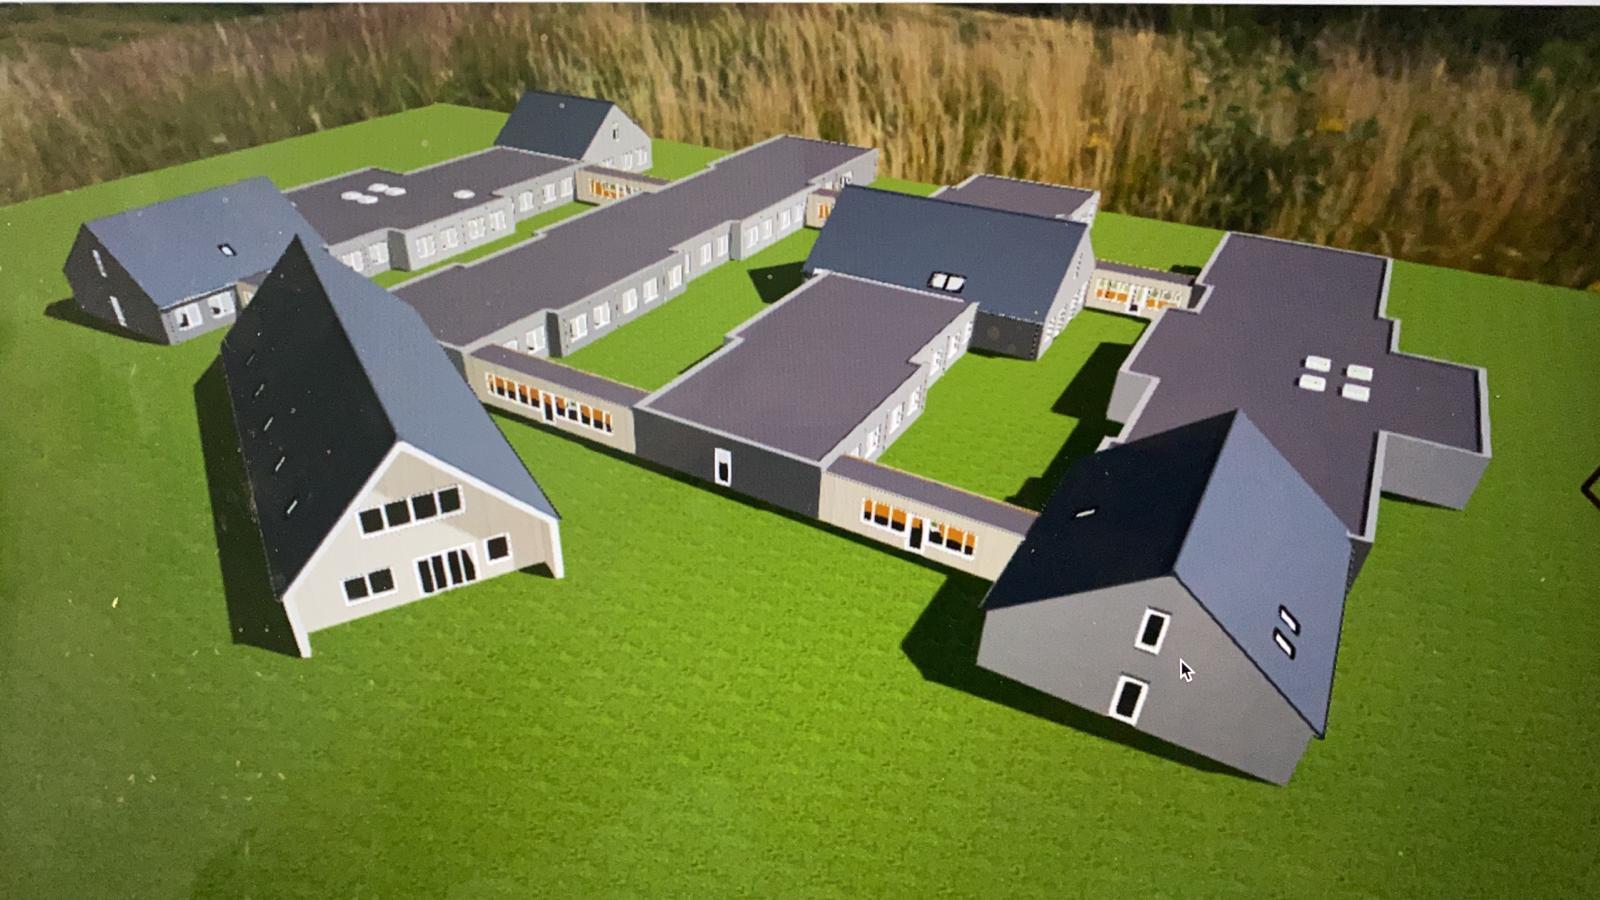 Inschrijven kleinschalig zorgcomplex Pim Senior in Dorst van start